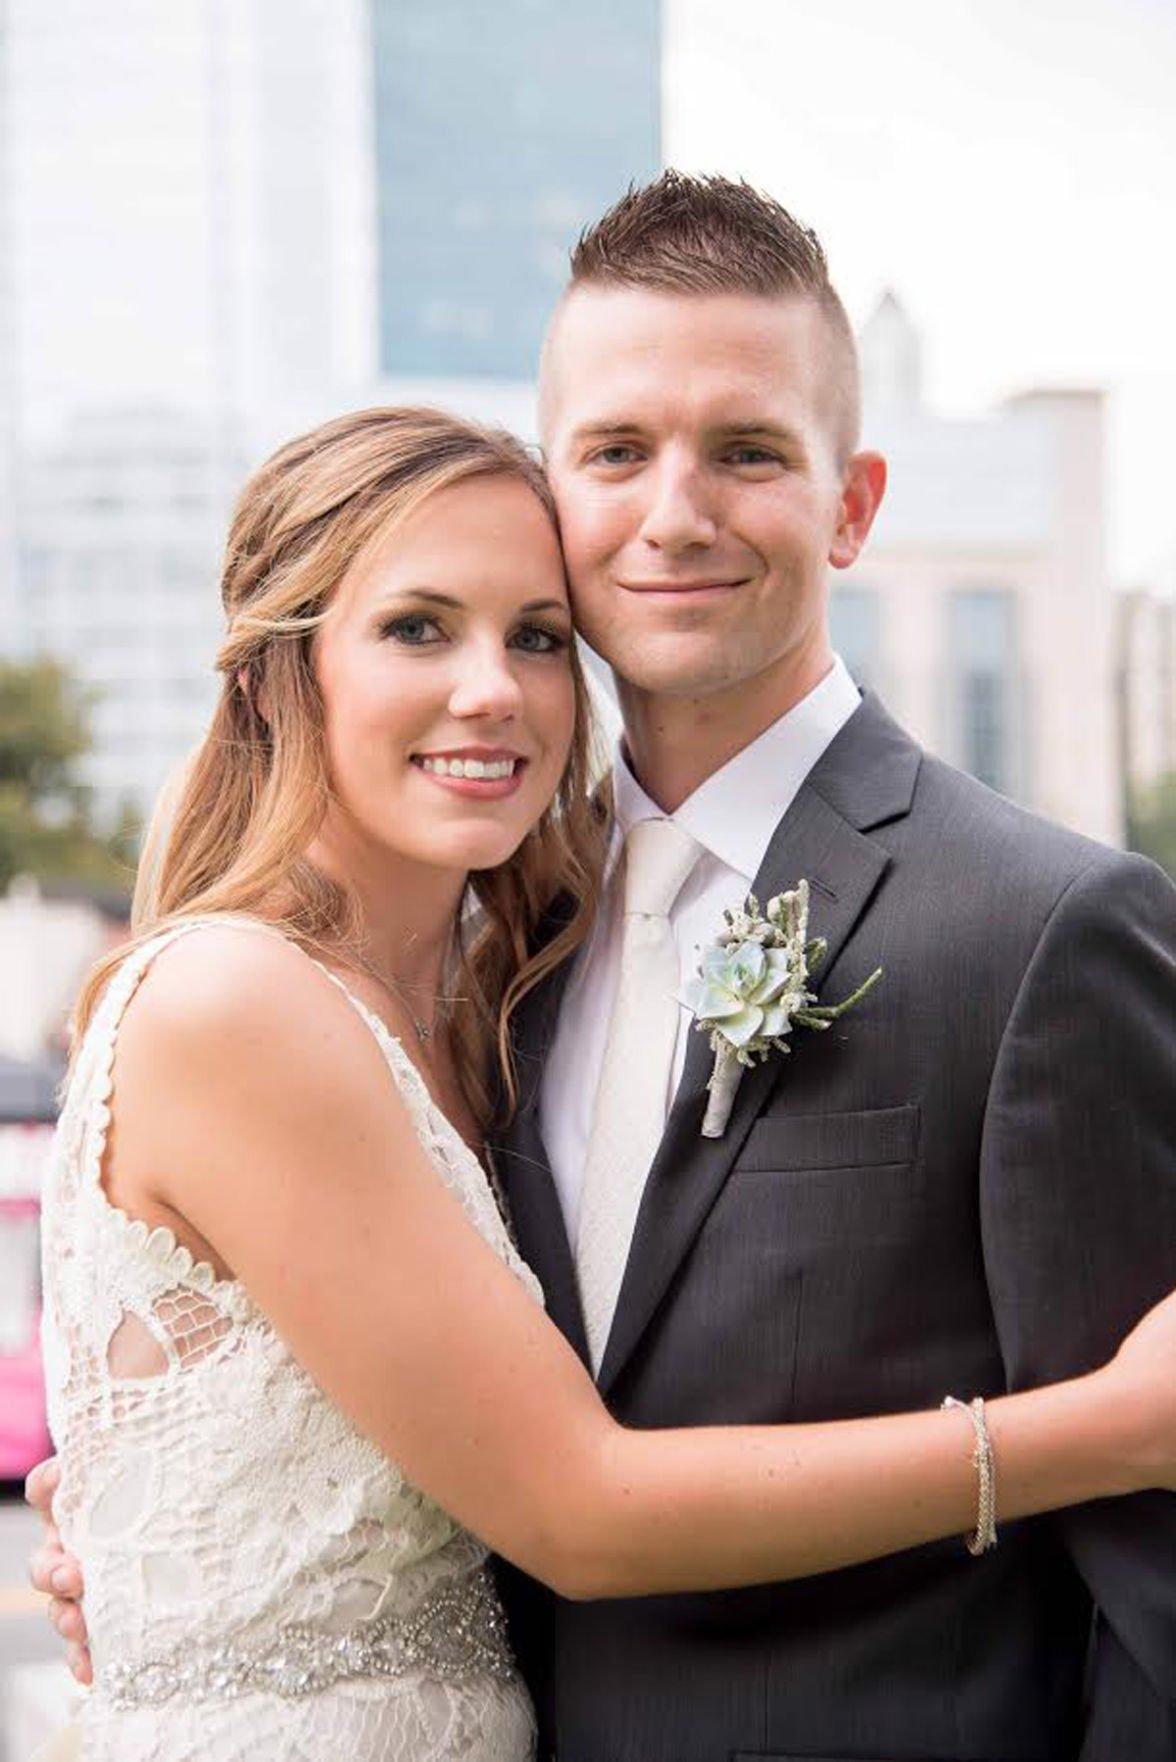 Mr. and Mrs. Adam Kenneth Crump